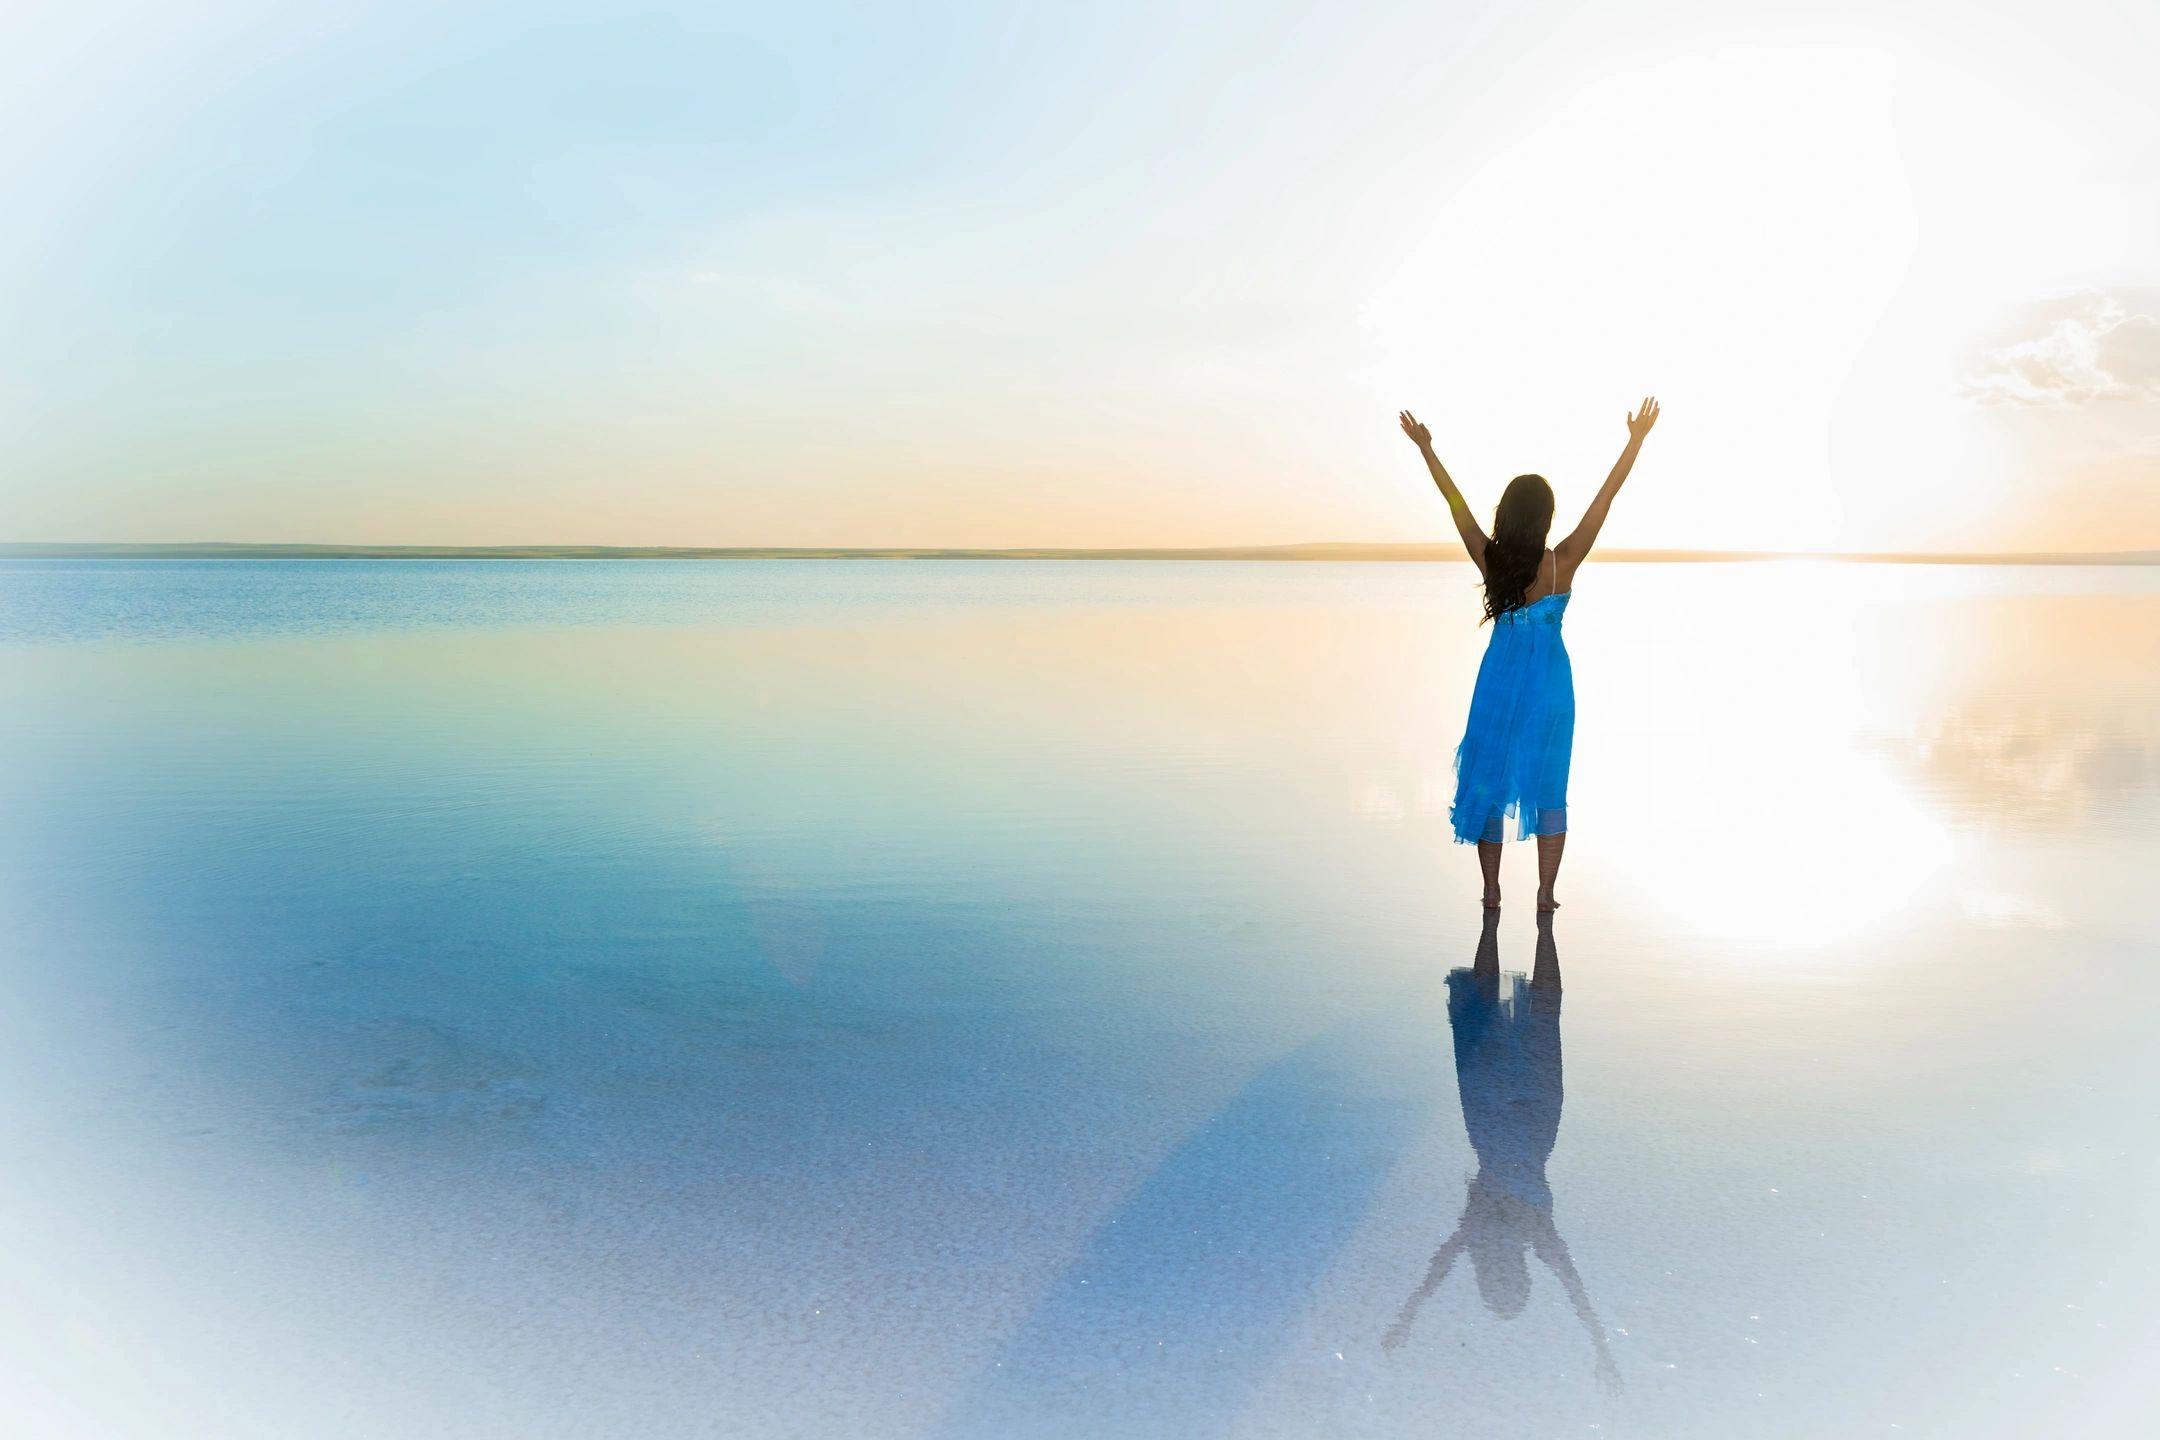 BUILD YOUR SELF ESTEEM, A STARTER GUIDE TO SELF IMPROVEMENT